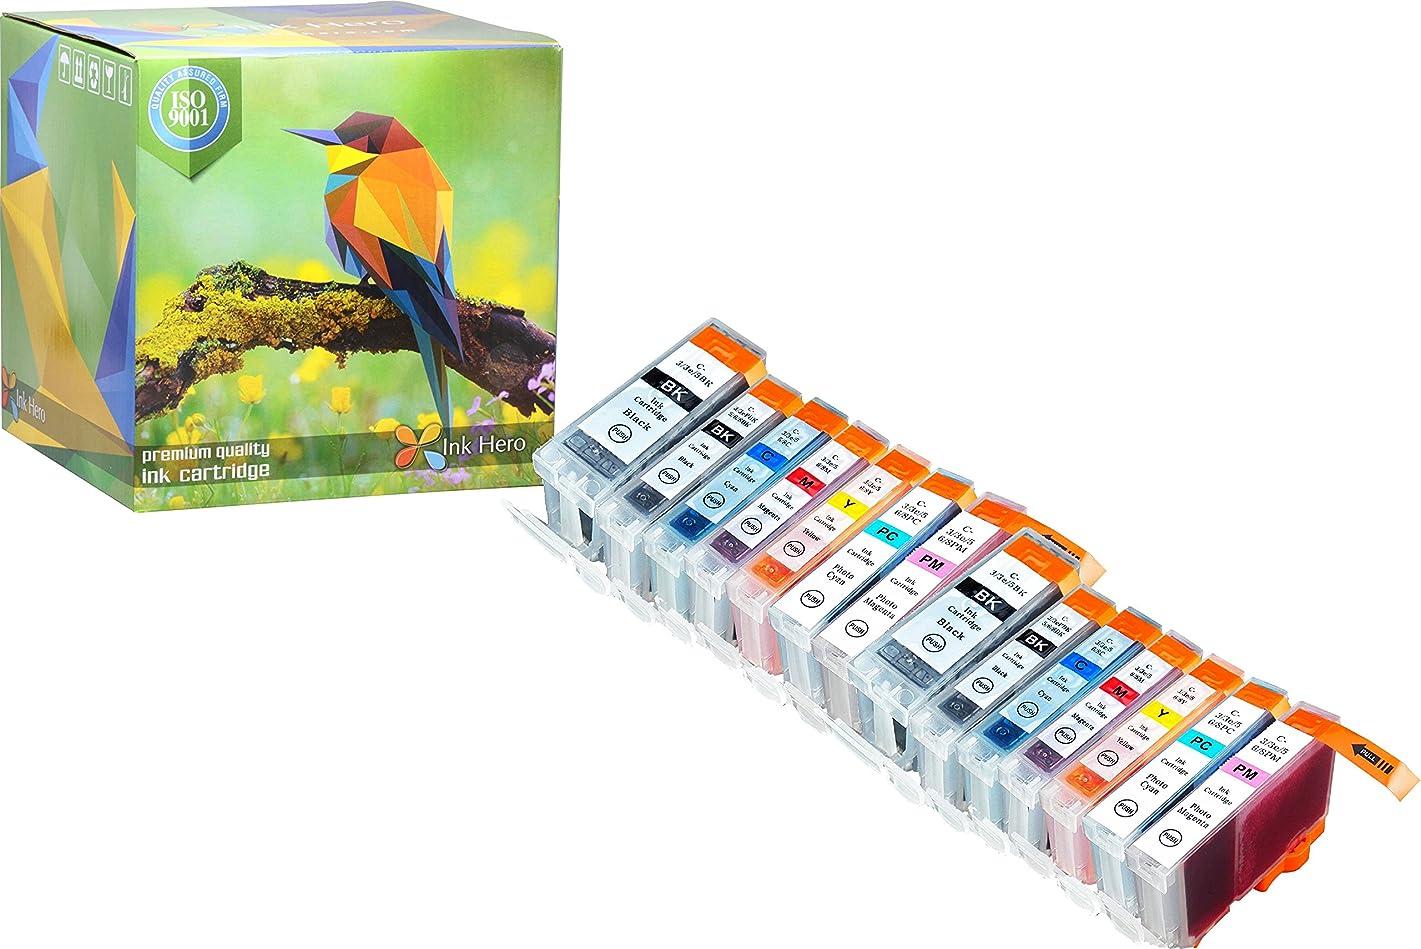 Ink Hero 14 Pack Ink Cartridges for BCI-3 BCI-6 BJC 8200 Pixma iP6000D S800 S820 S820D S830d S900 S9000 i900D i9100 i950 i960 printer inks for inkjet printers